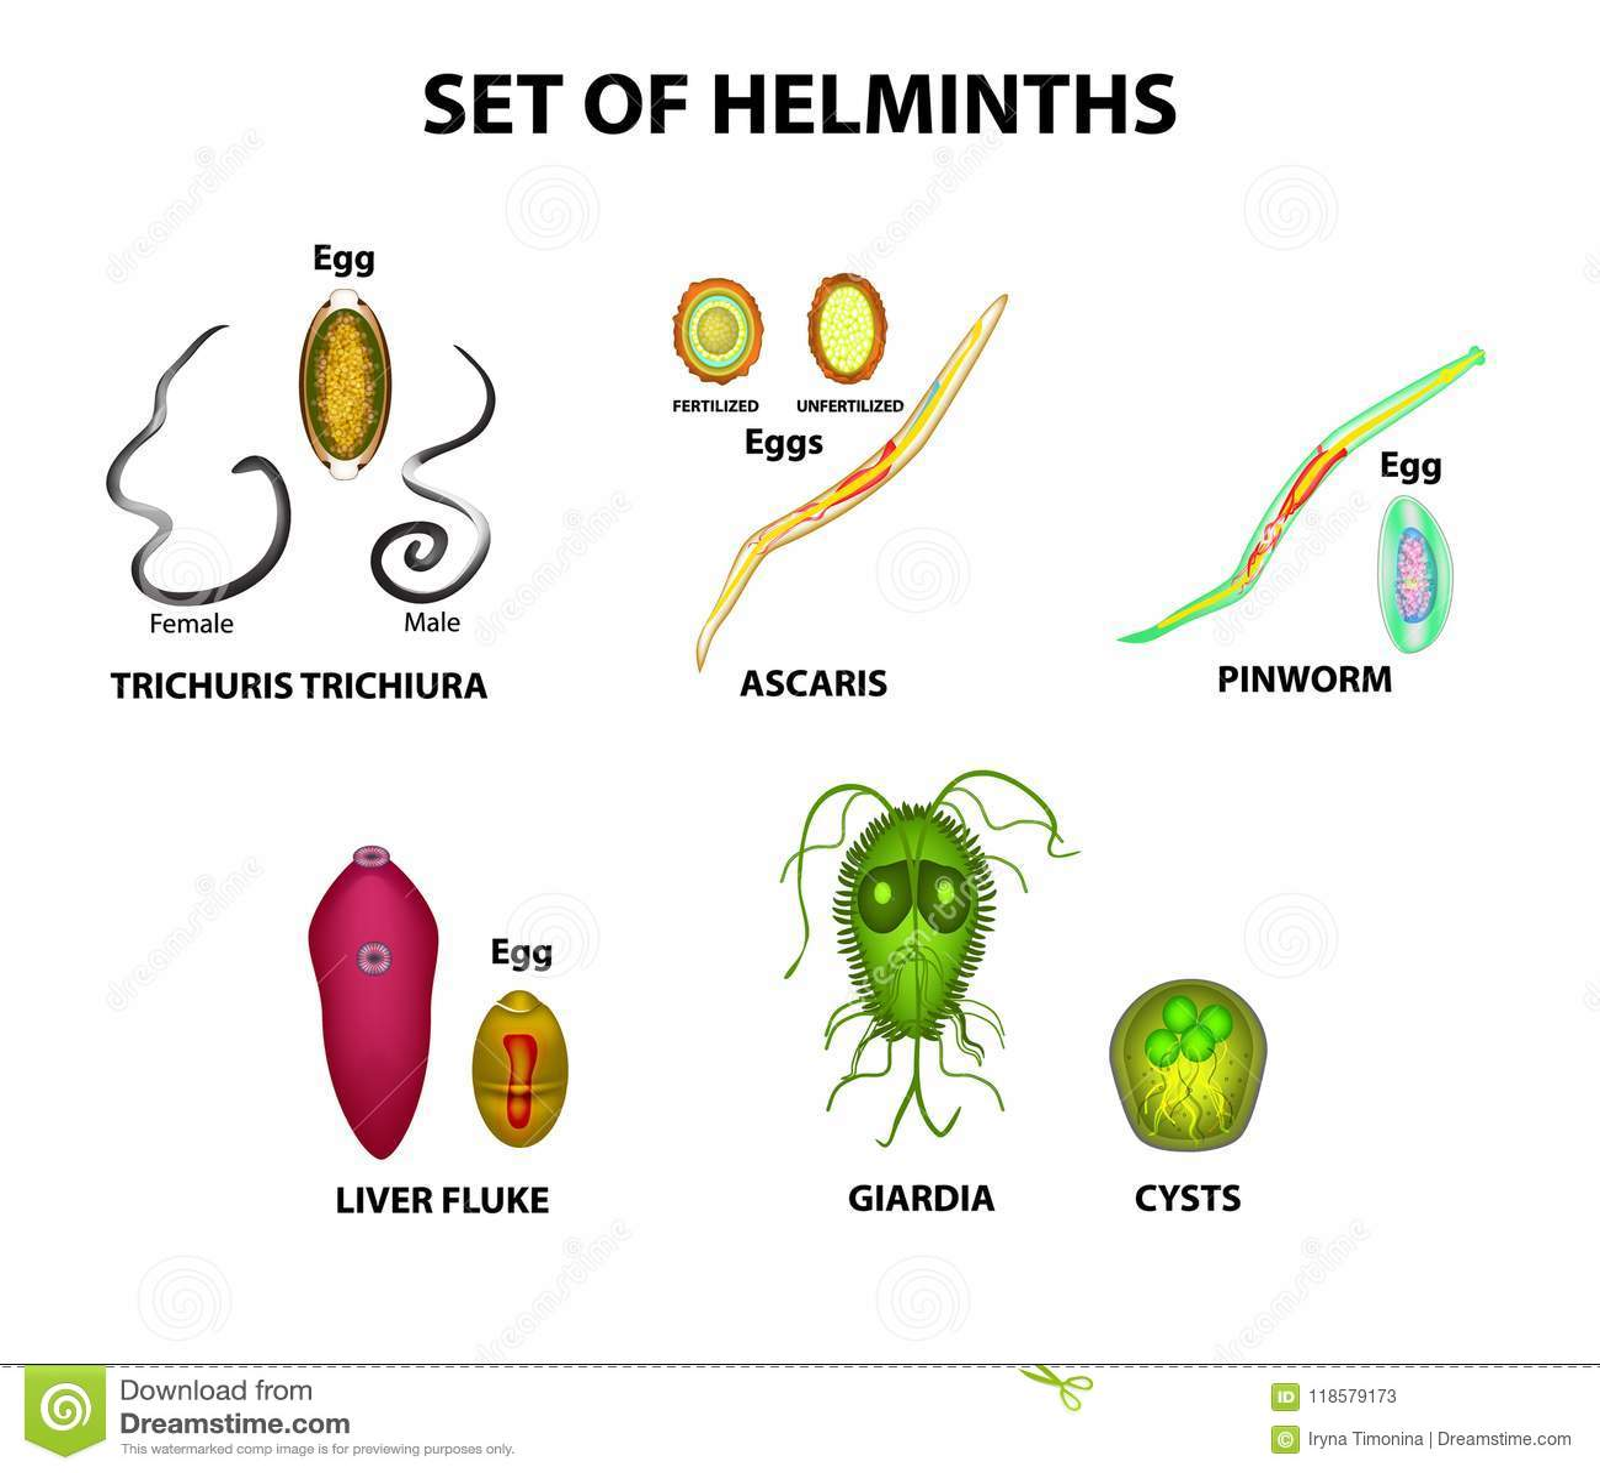 Anthelmintic meaning. Anthelmintic meaning uk